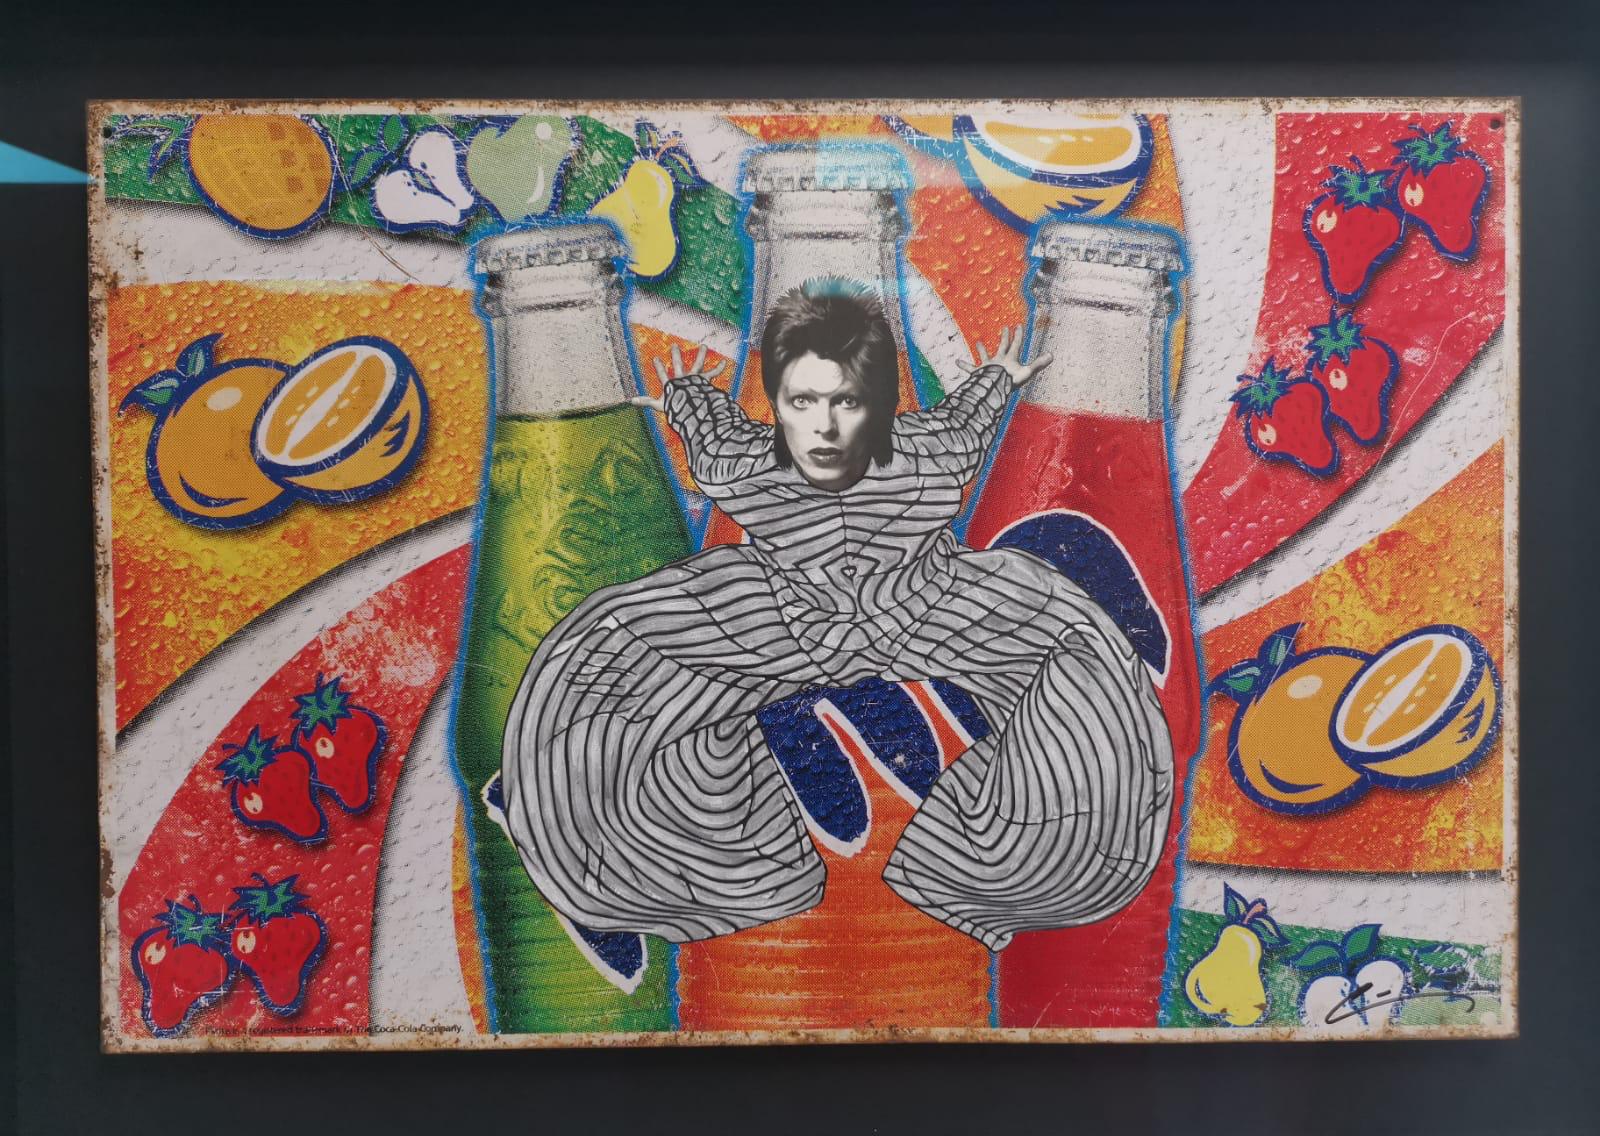 Pakpoom Silaphan Bowie on Fanta 002